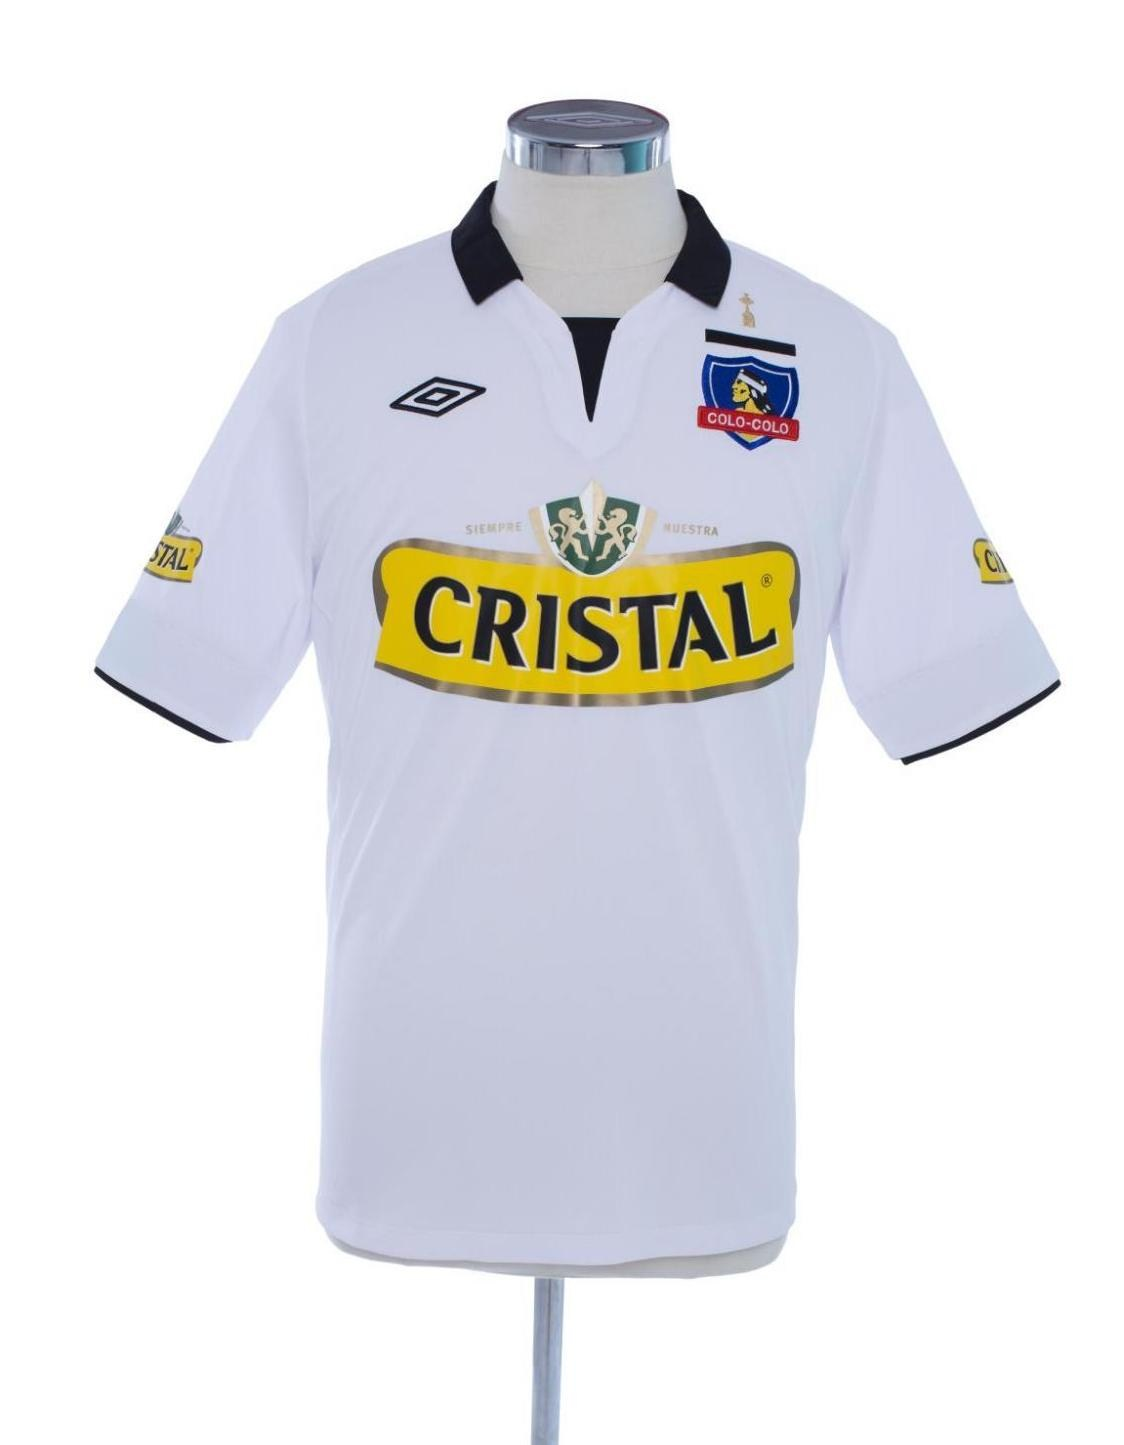 Yükle (720x405) · Colo Colo 2013 Umbro Home   Away Football Shirts 12 13  Kits Football shirt blog 0f21c6d76